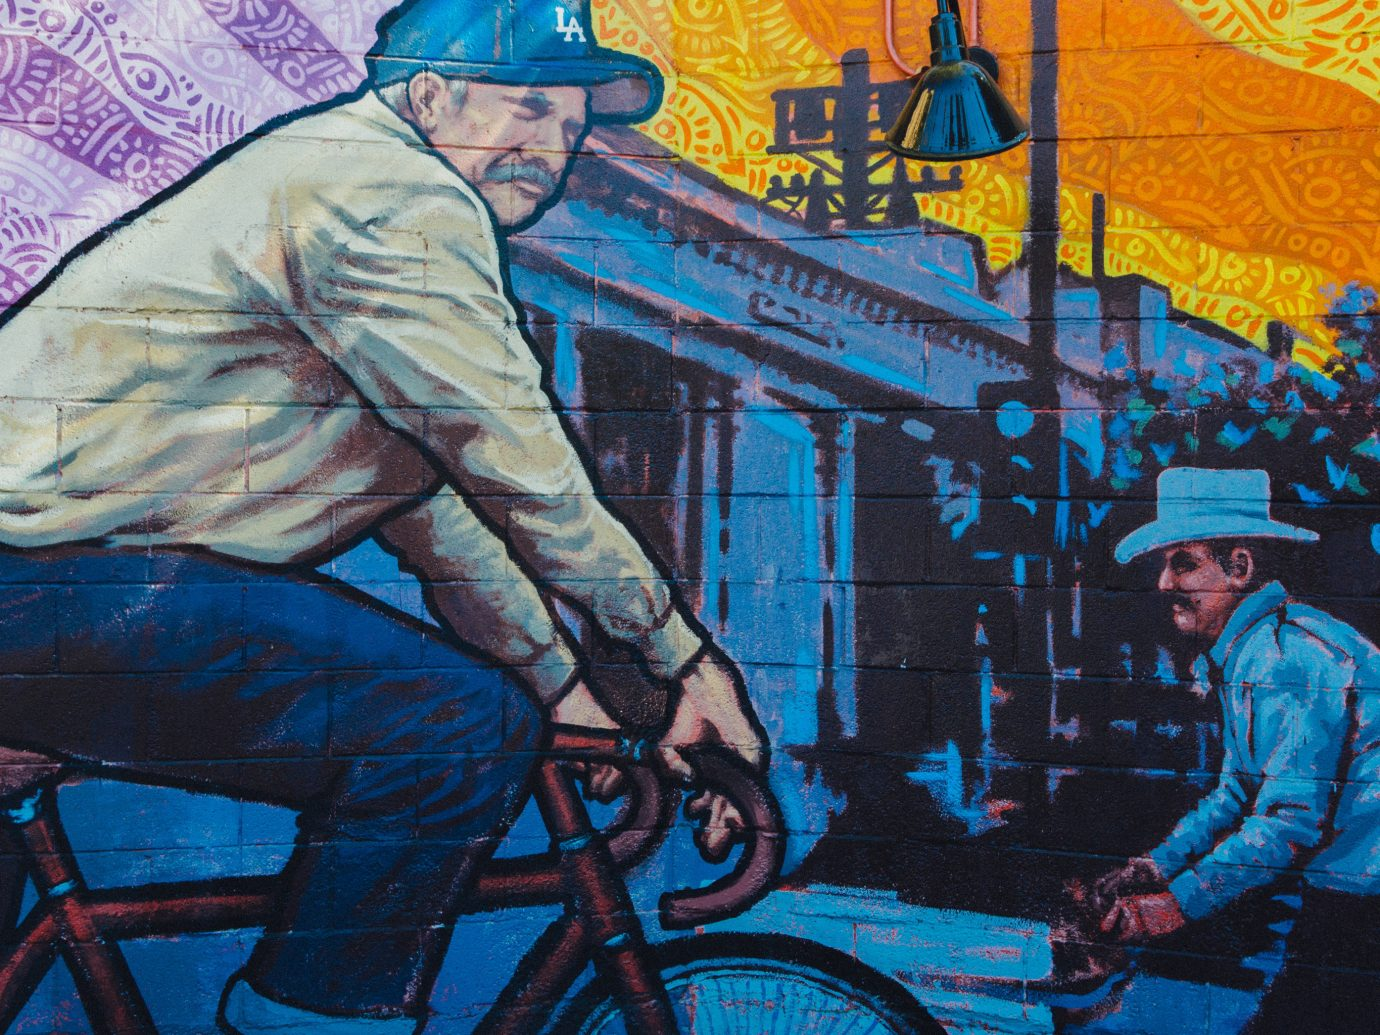 Food + Drink person outdoor mural comic book art comics screenshot illustration painting